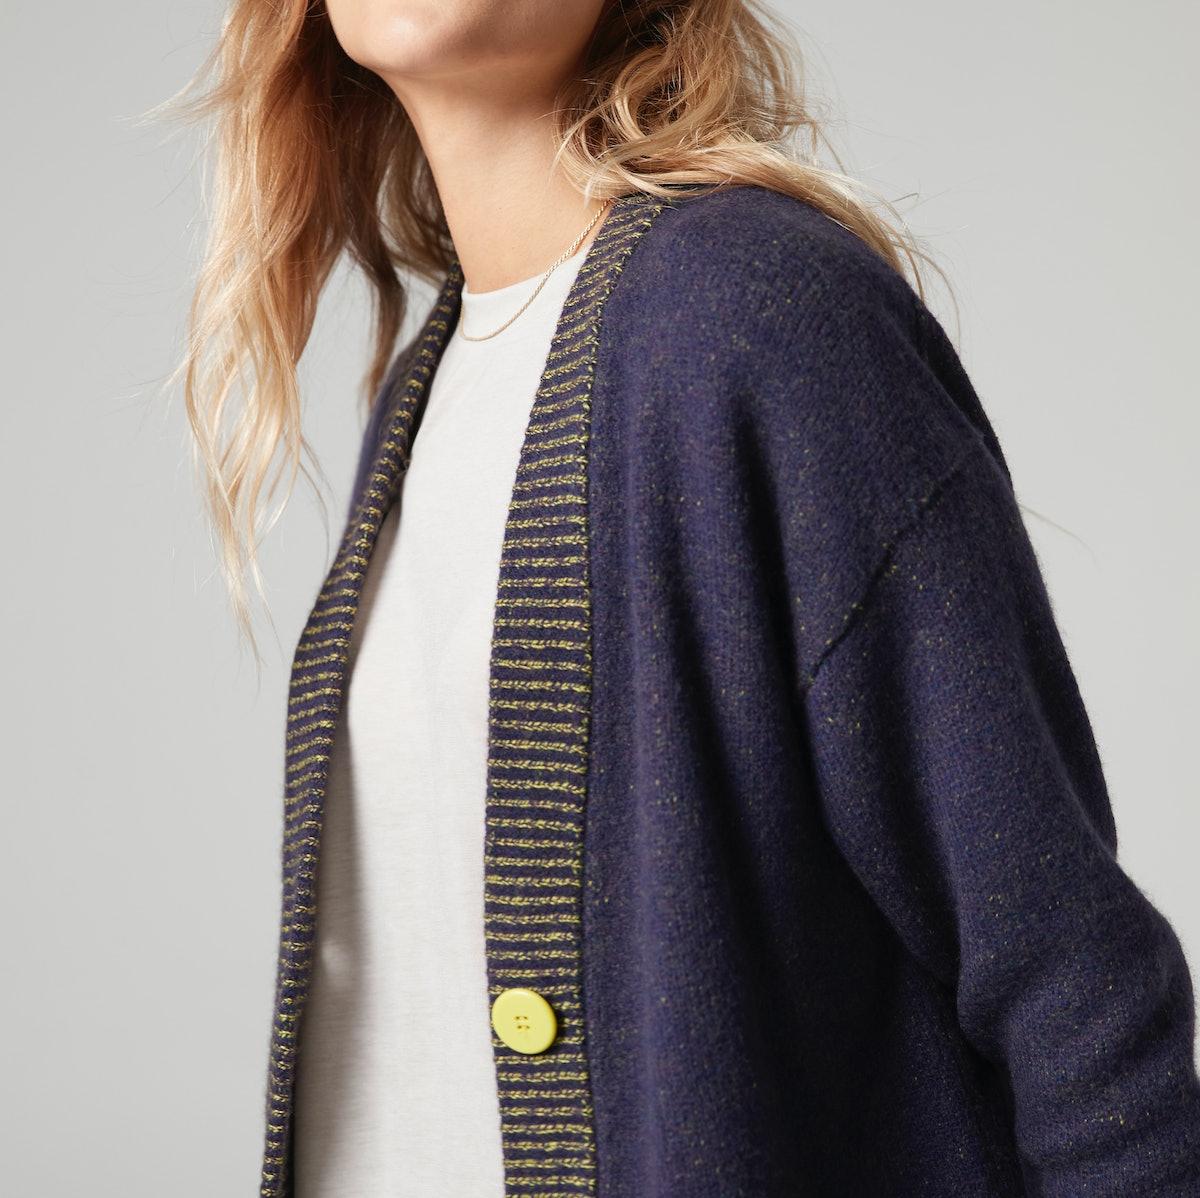 Allbirds Wool Cardi